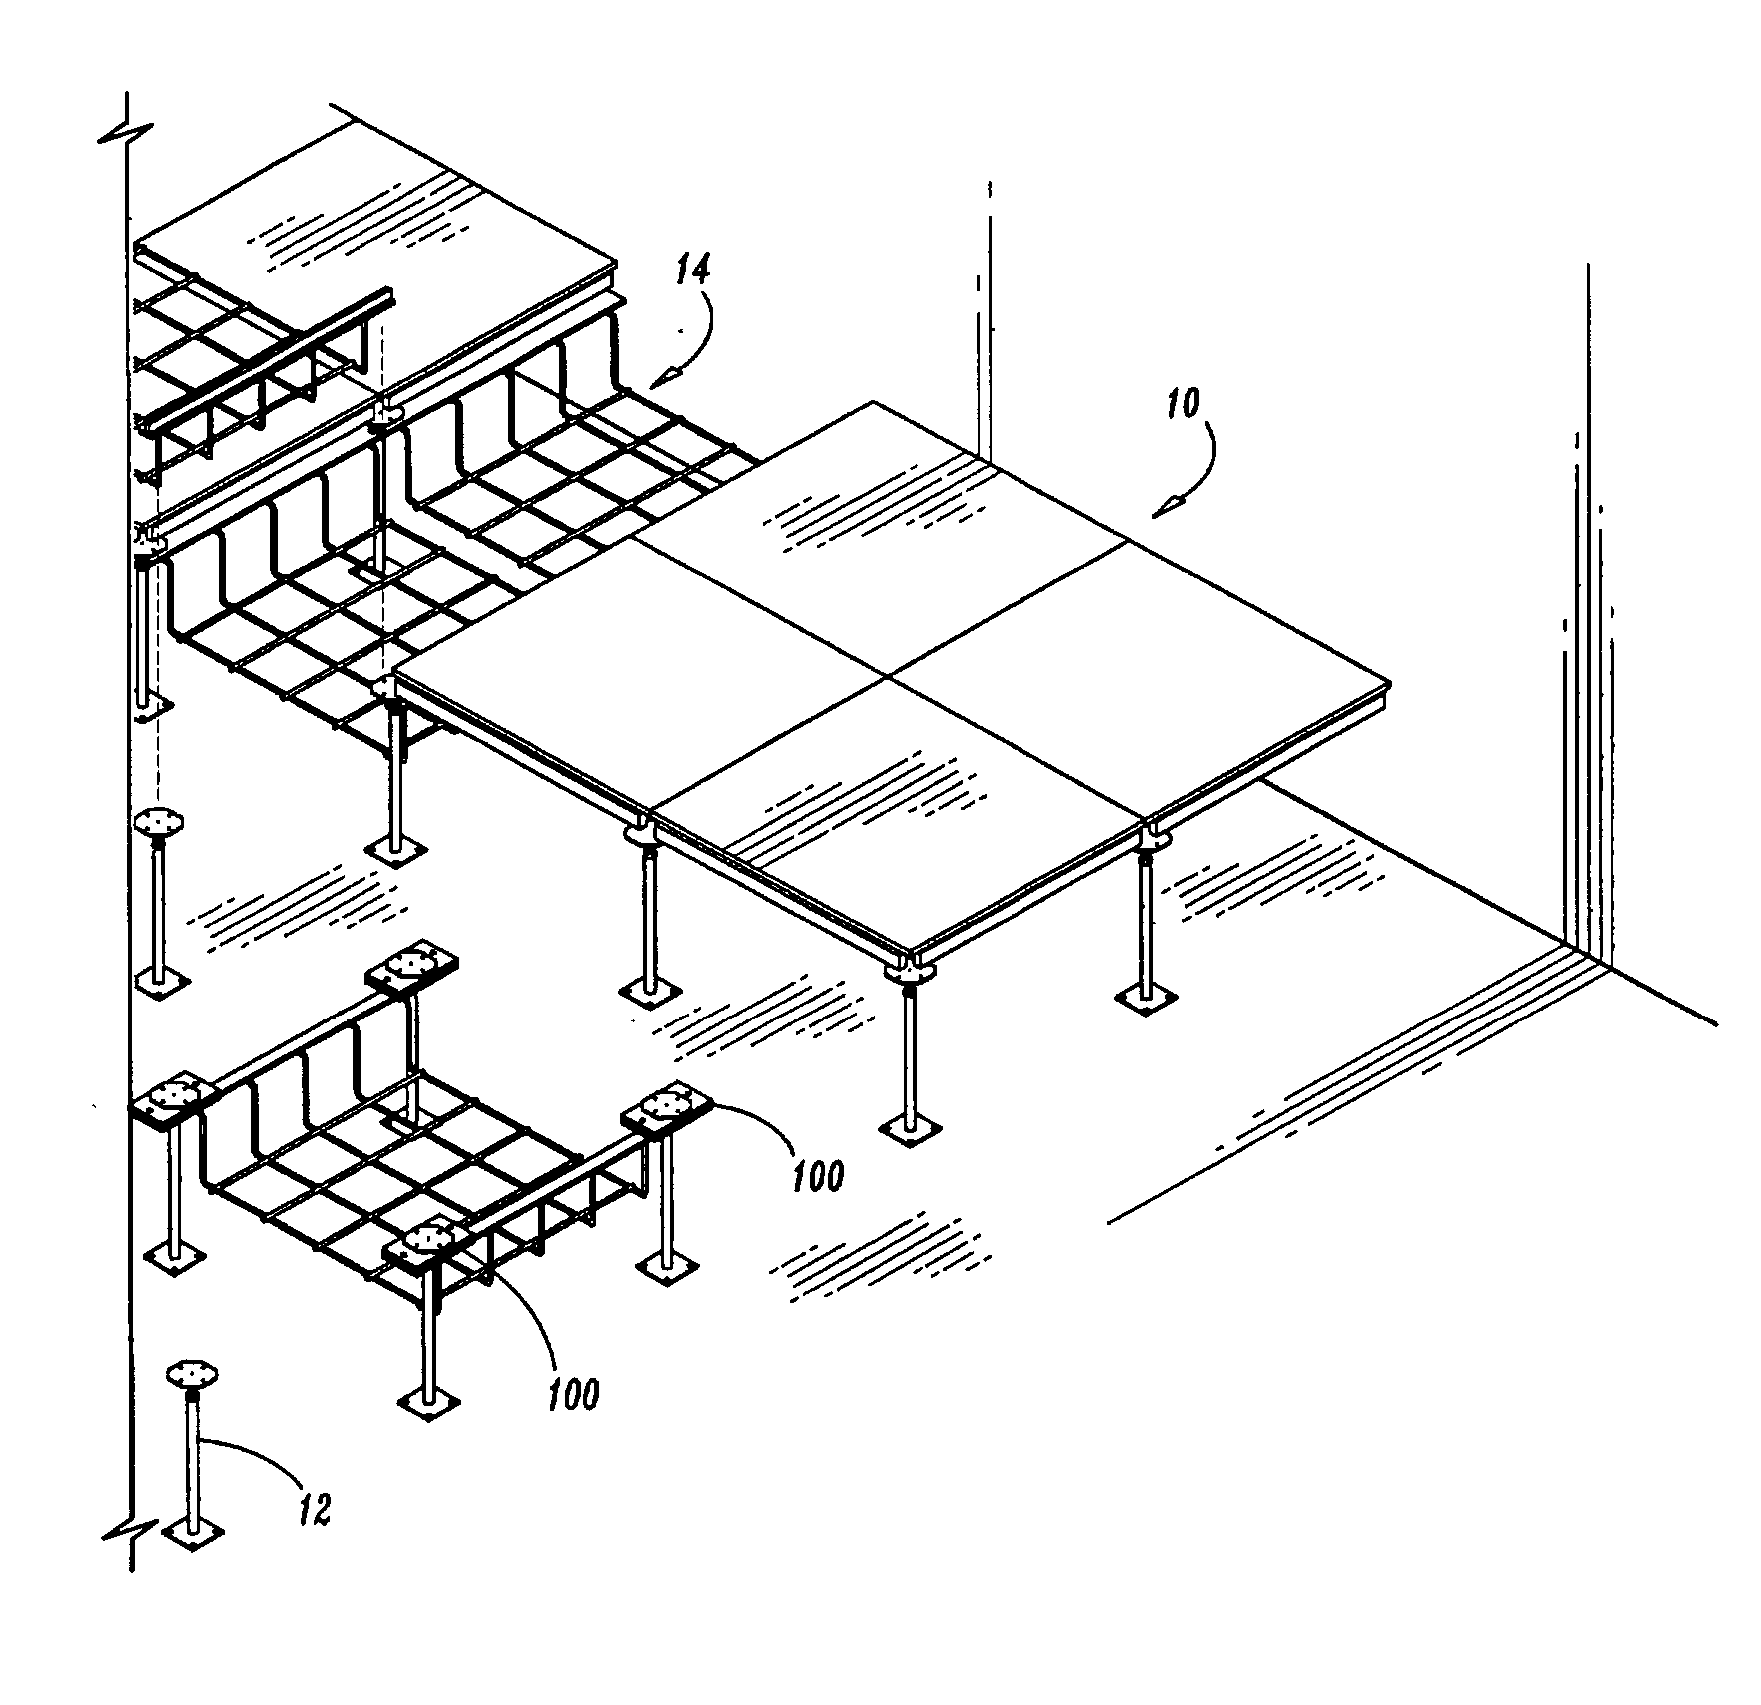 Le Grand Rj45 Jack Wiring Diagram RJ45 Wiring Diagram PDF